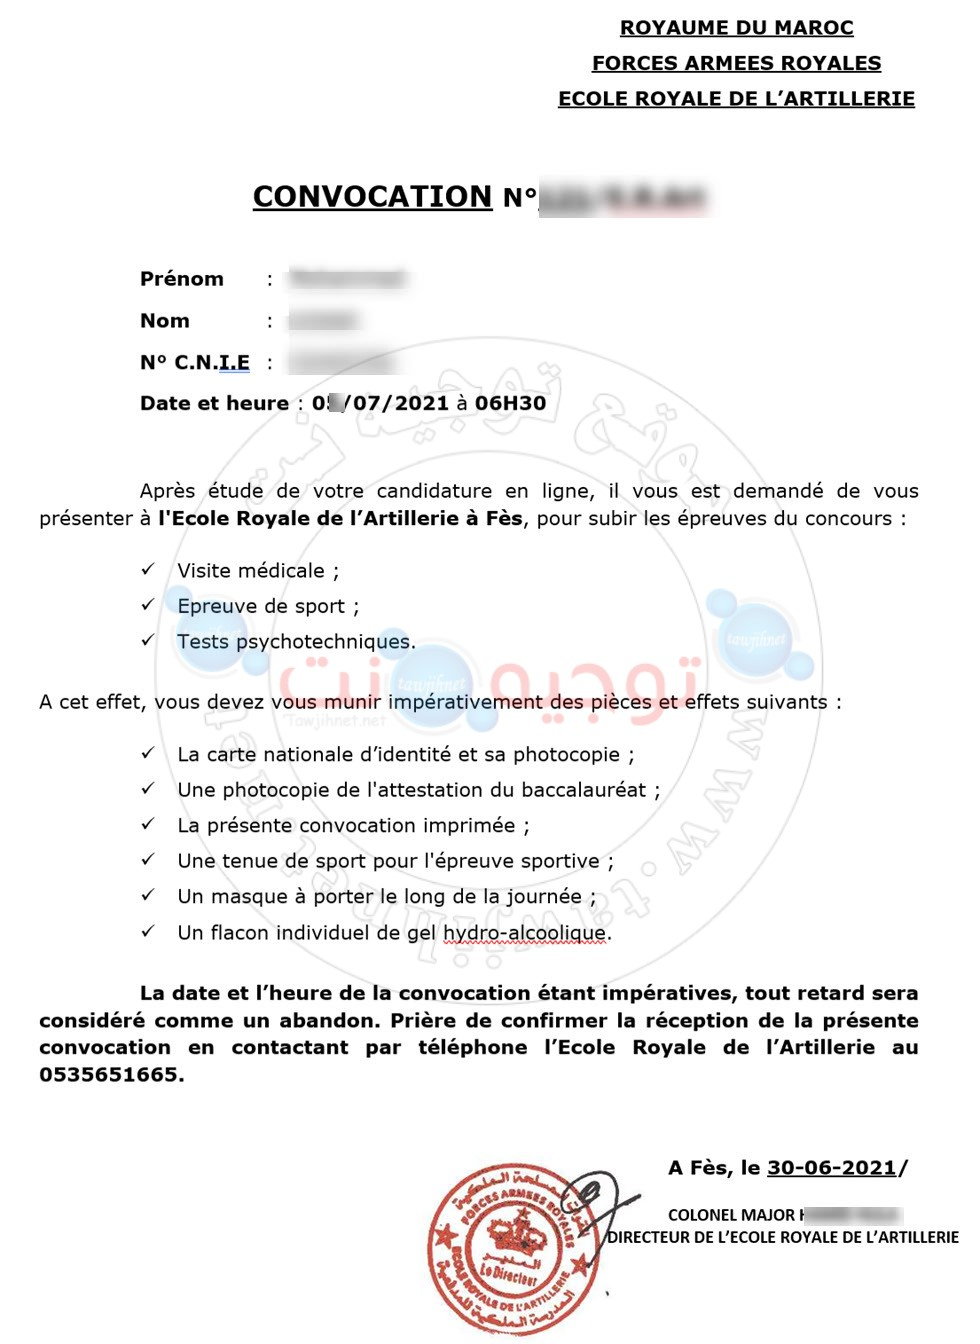 convocation-far-ECOLE ROYALE DE ARTILLERIE.jpg